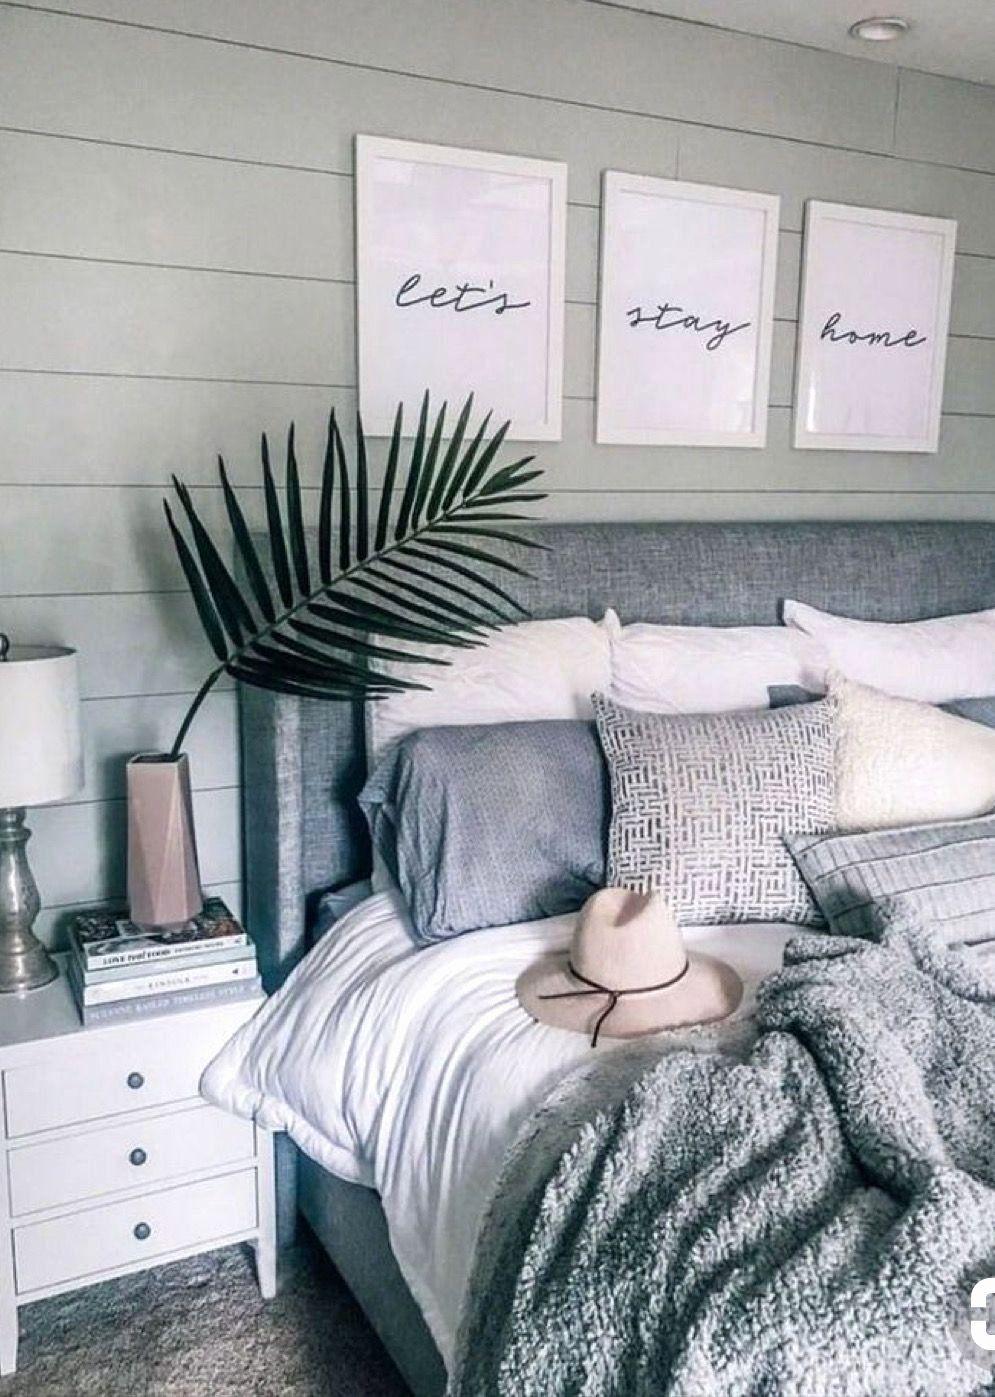 Grey Headboard Bedroom Ideas Inspirational Grey Headboard White And Grey Theme In 2020 Home Decor Bedroom Minimalist Living Room Minimalist Bedroom